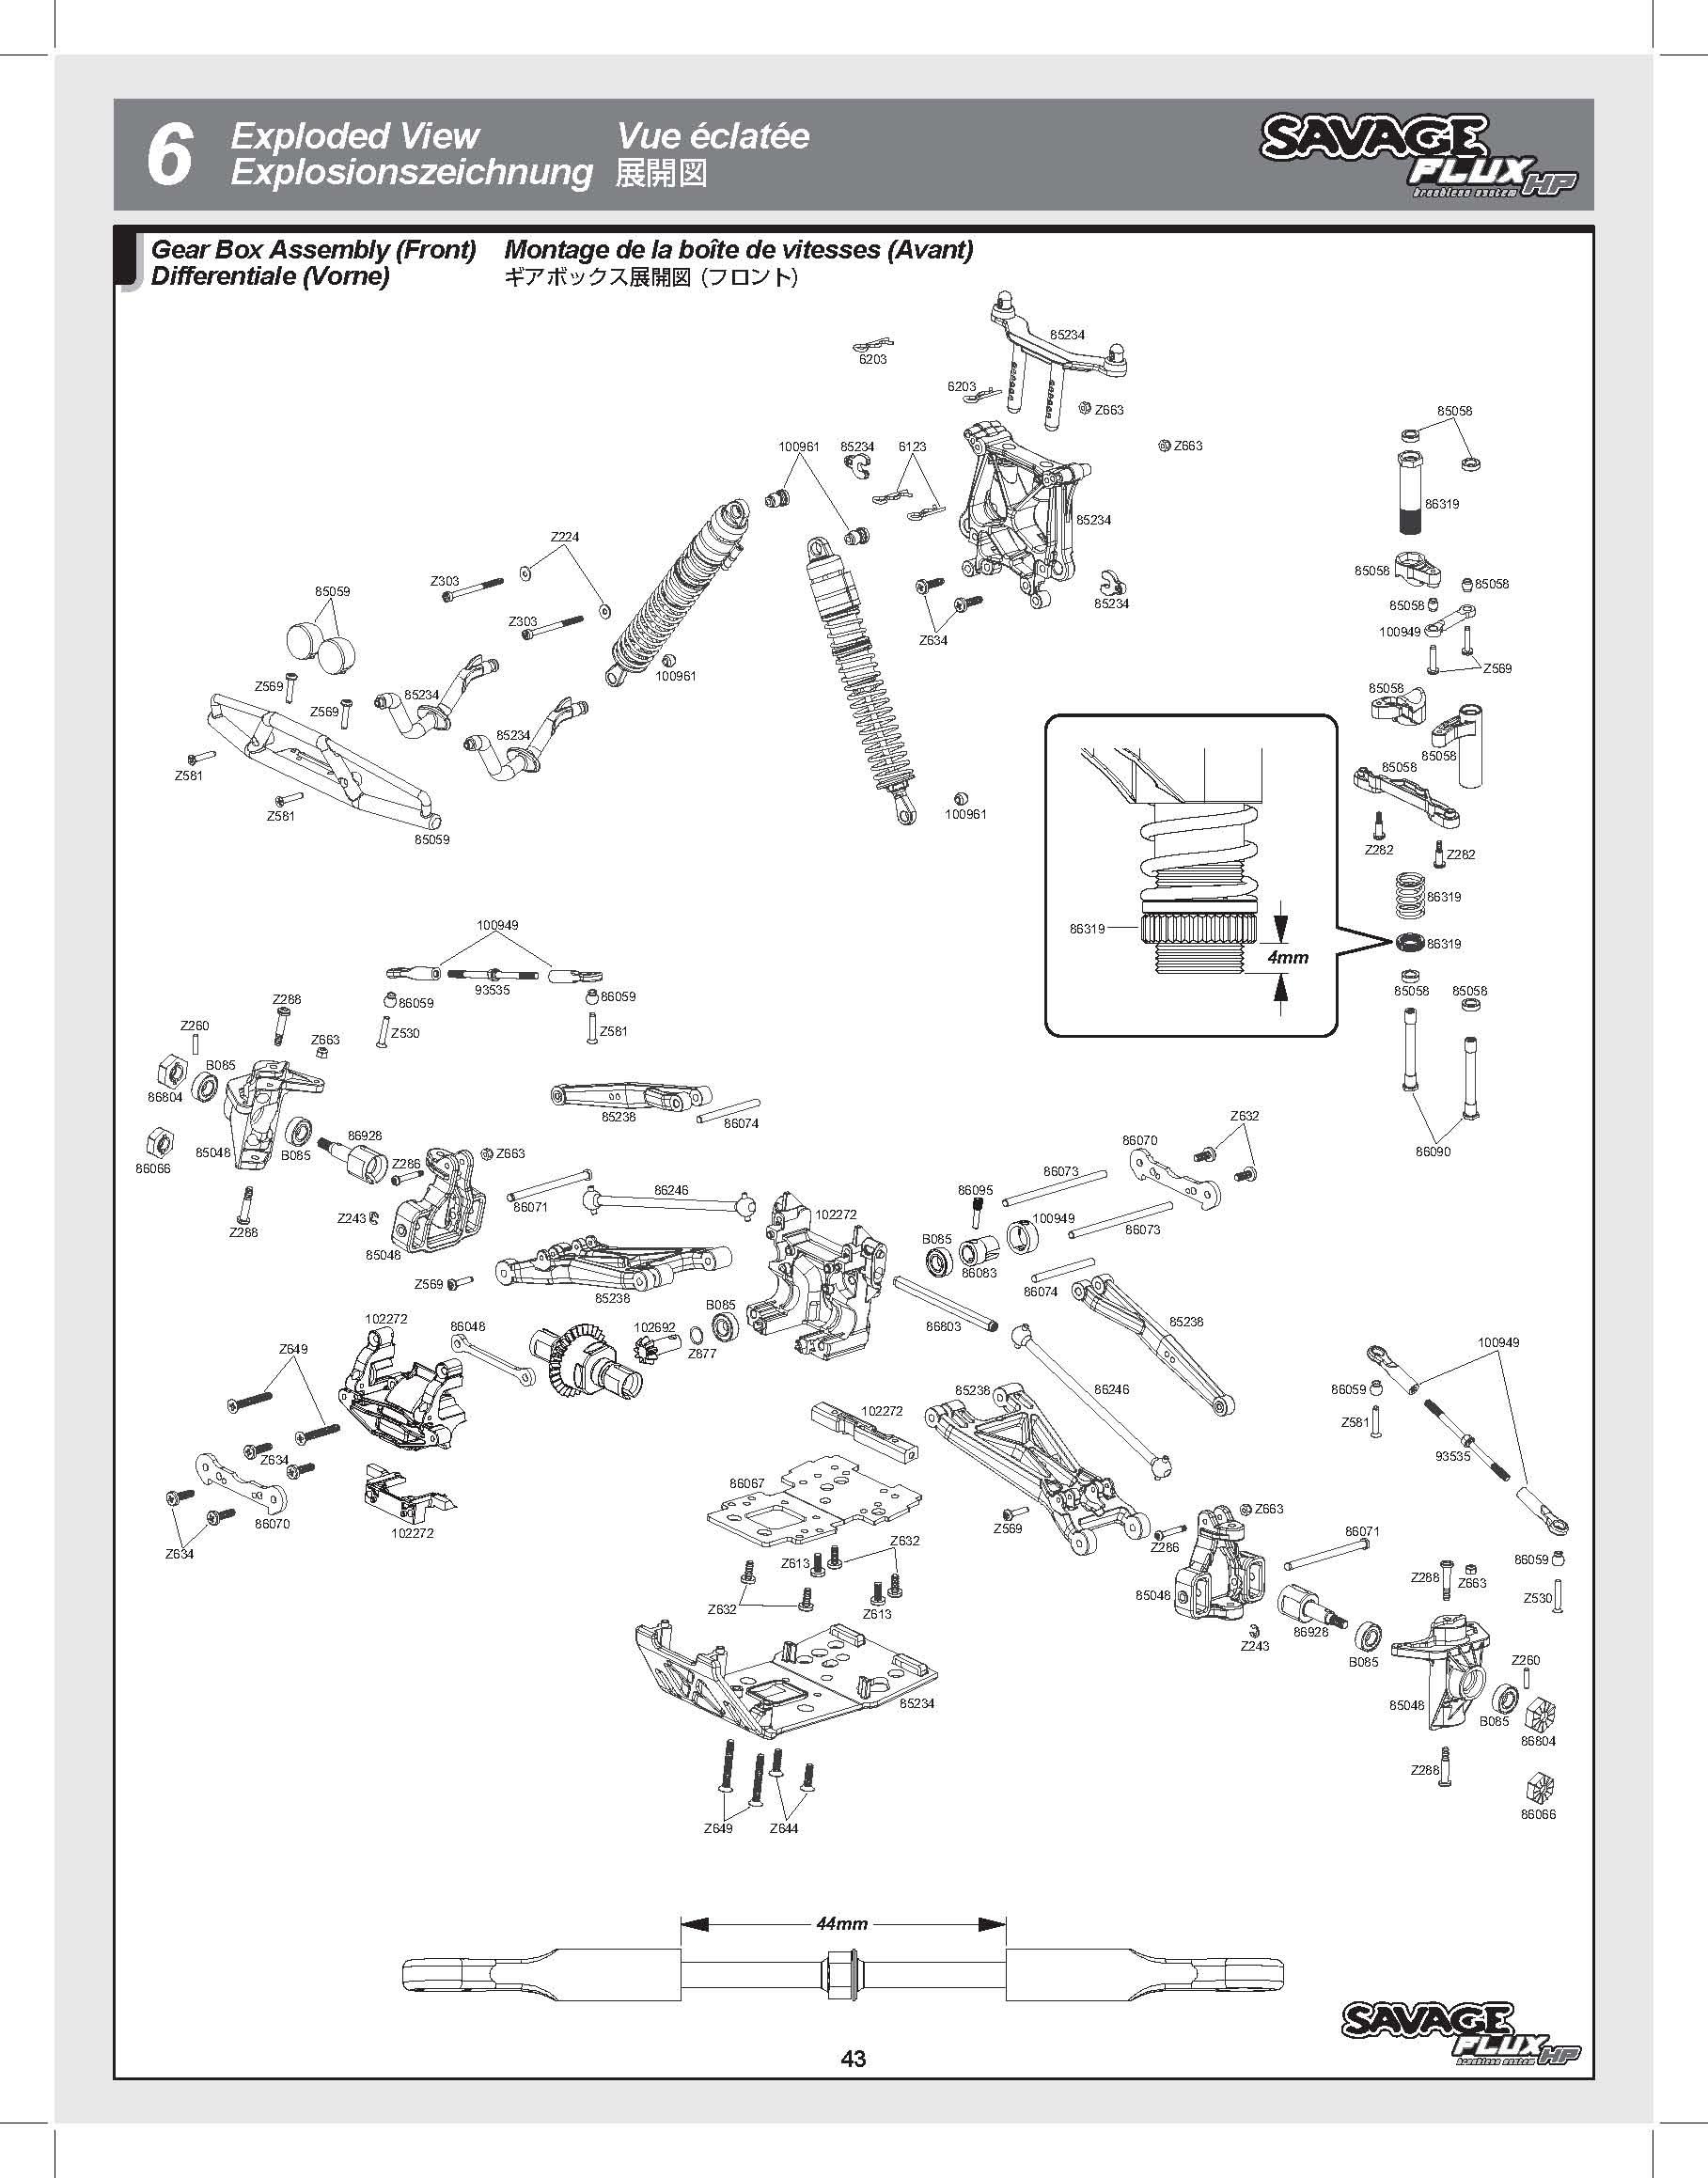 hpi savage diagram traxxas savage diagram